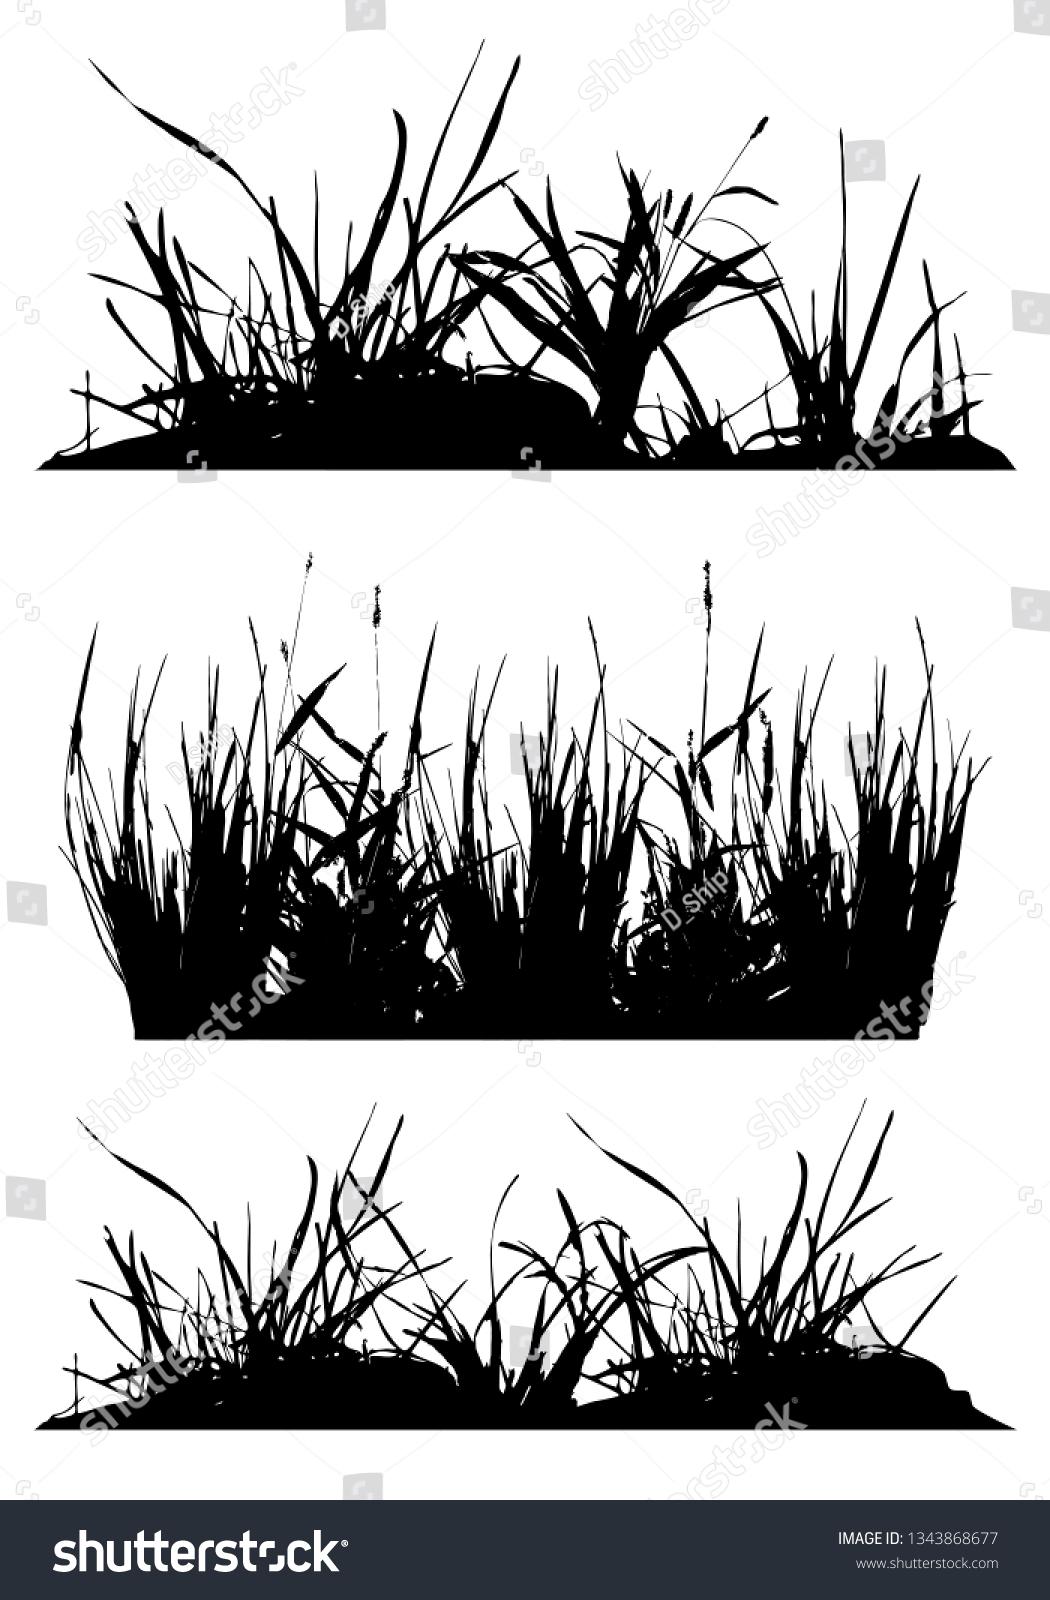 set silhouettes grass black white vector stock vector royalty free 1343868677 https www shutterstock com image vector set silhouettes grass black white vector 1343868677